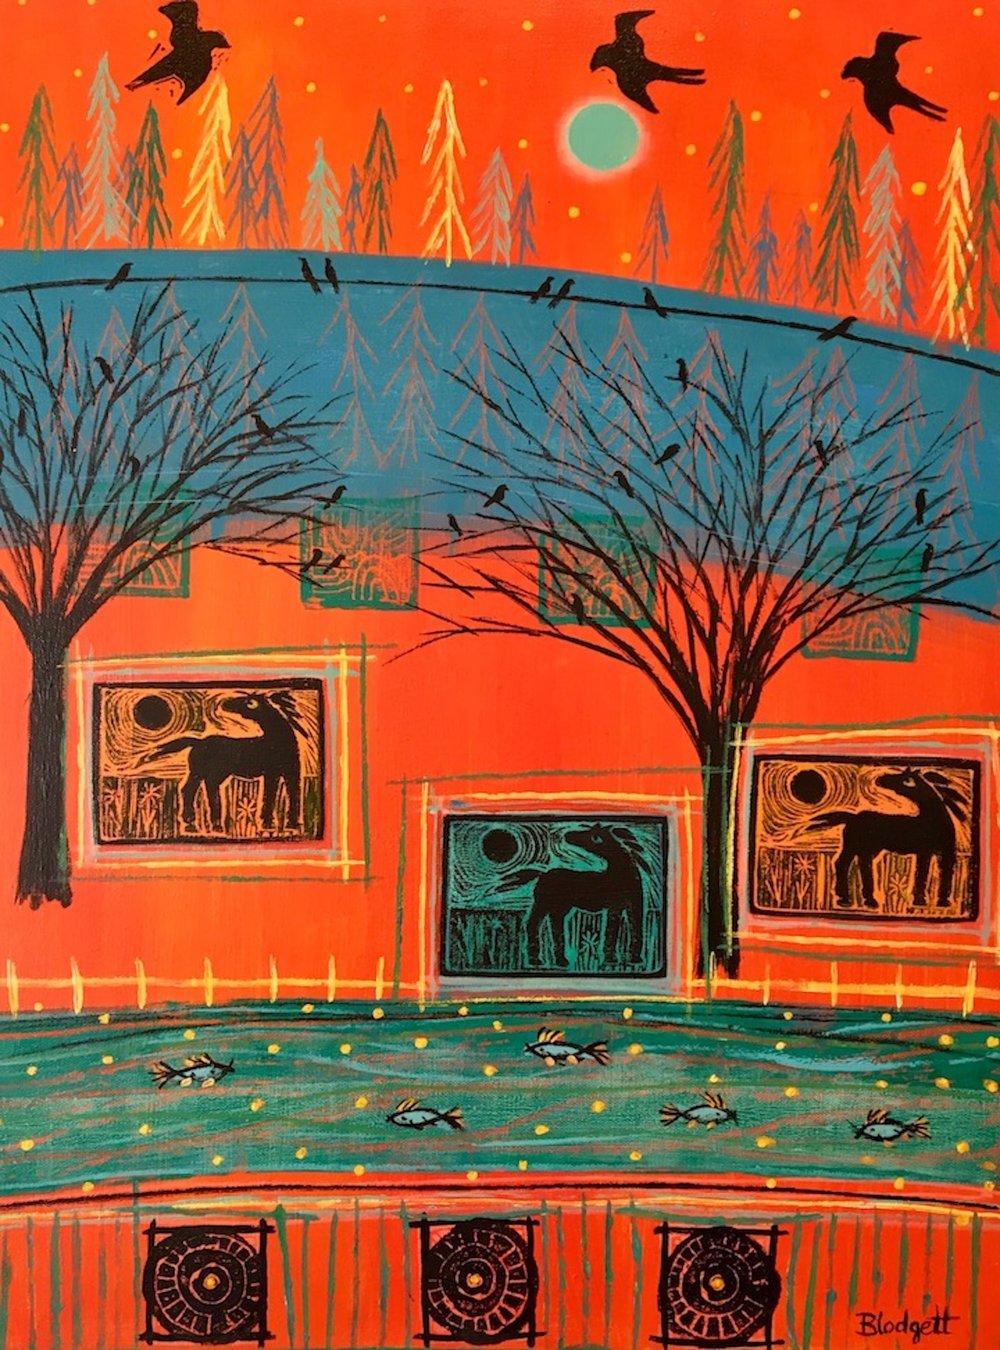 Caballos del Rio by Eileen Blodgett